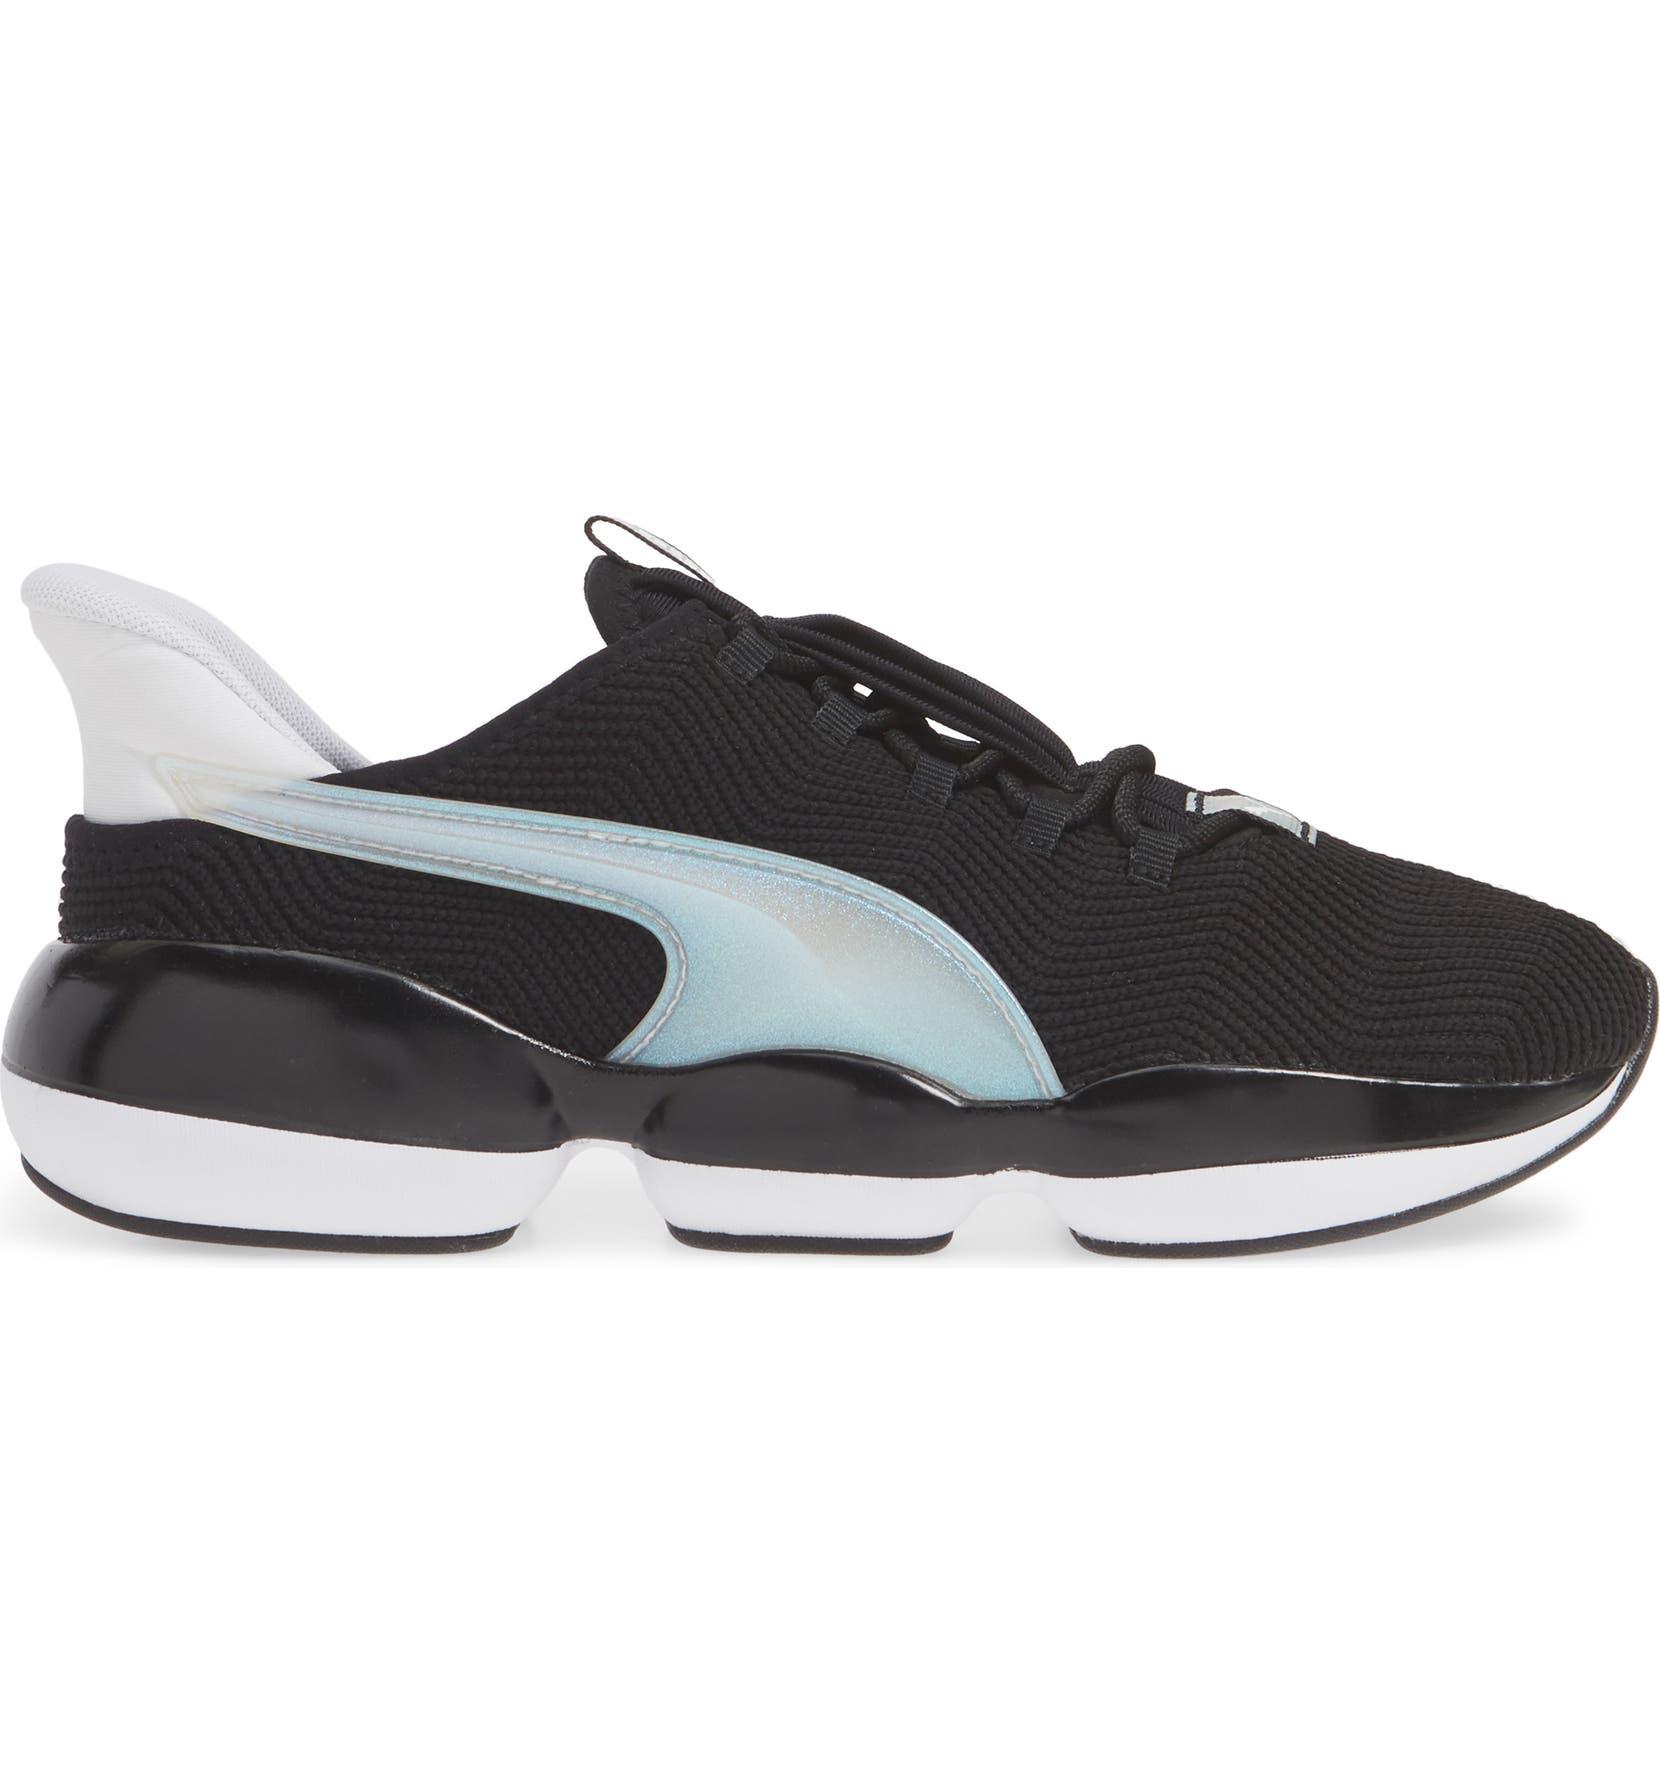 a34bc03b PUMA Mode XT Iridescent TZ Hybrid Training Shoe (Women) | Nordstrom